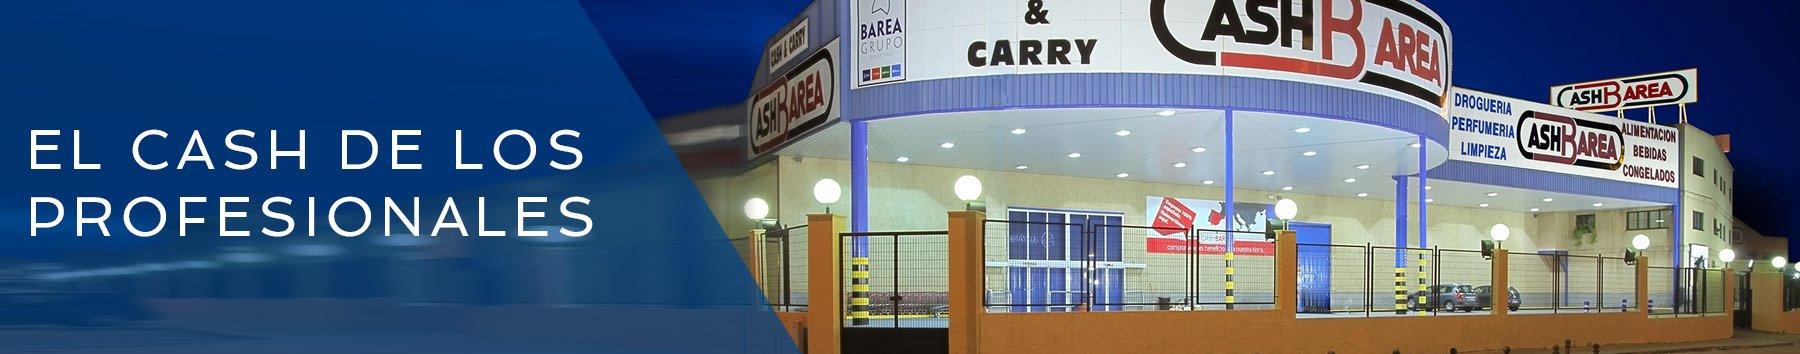 Cash Barea Sevilla - Cash Barea